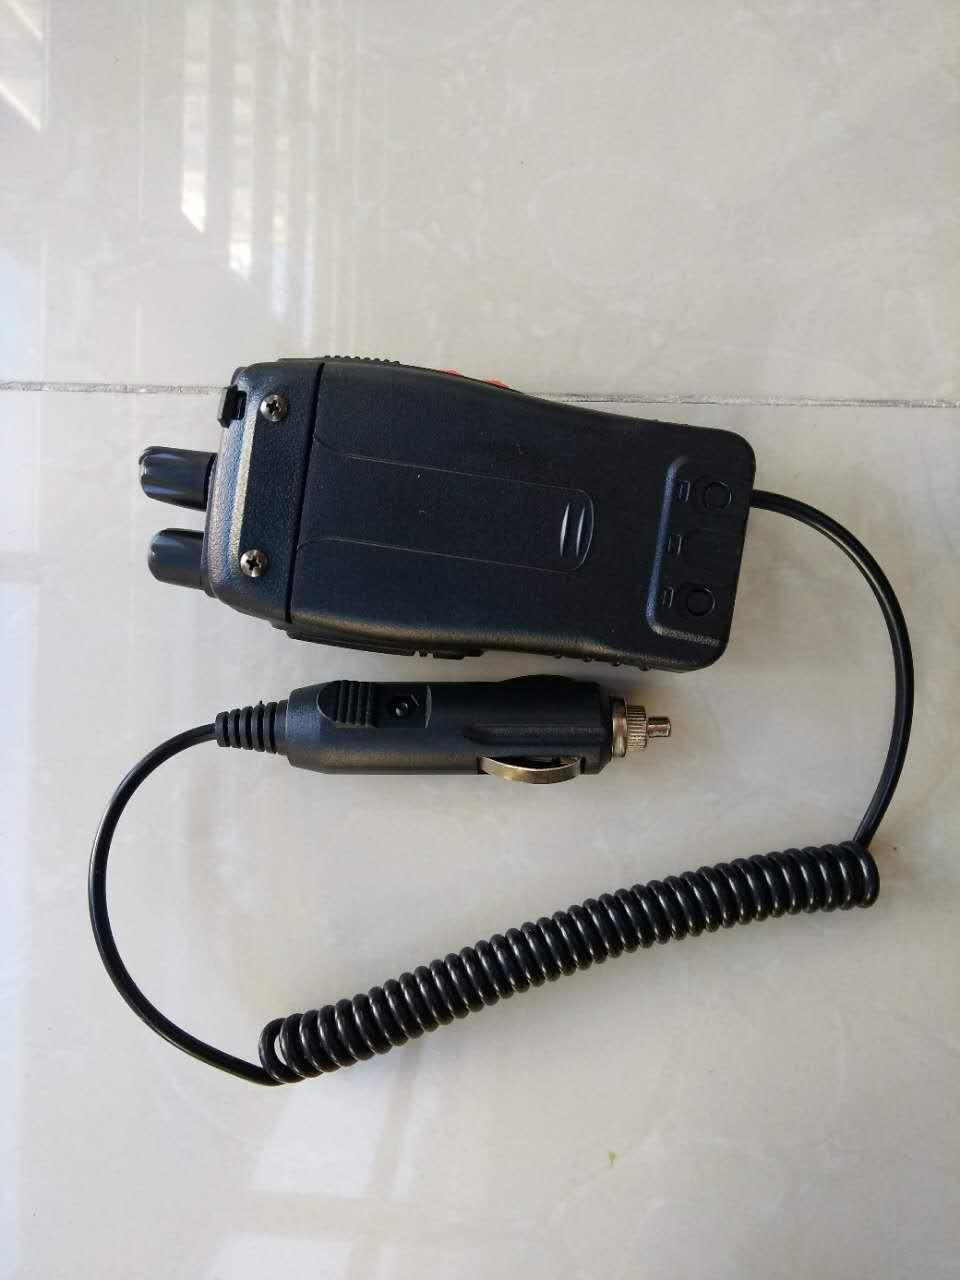 Image 4 - Baofeng 888S walkie talkie eliminator car charger Battery Case Eliminator Baofeng bf 888s Car Charger For BF 888S H 777 H777 666-in Walkie Talkie from Cellphones & Telecommunications